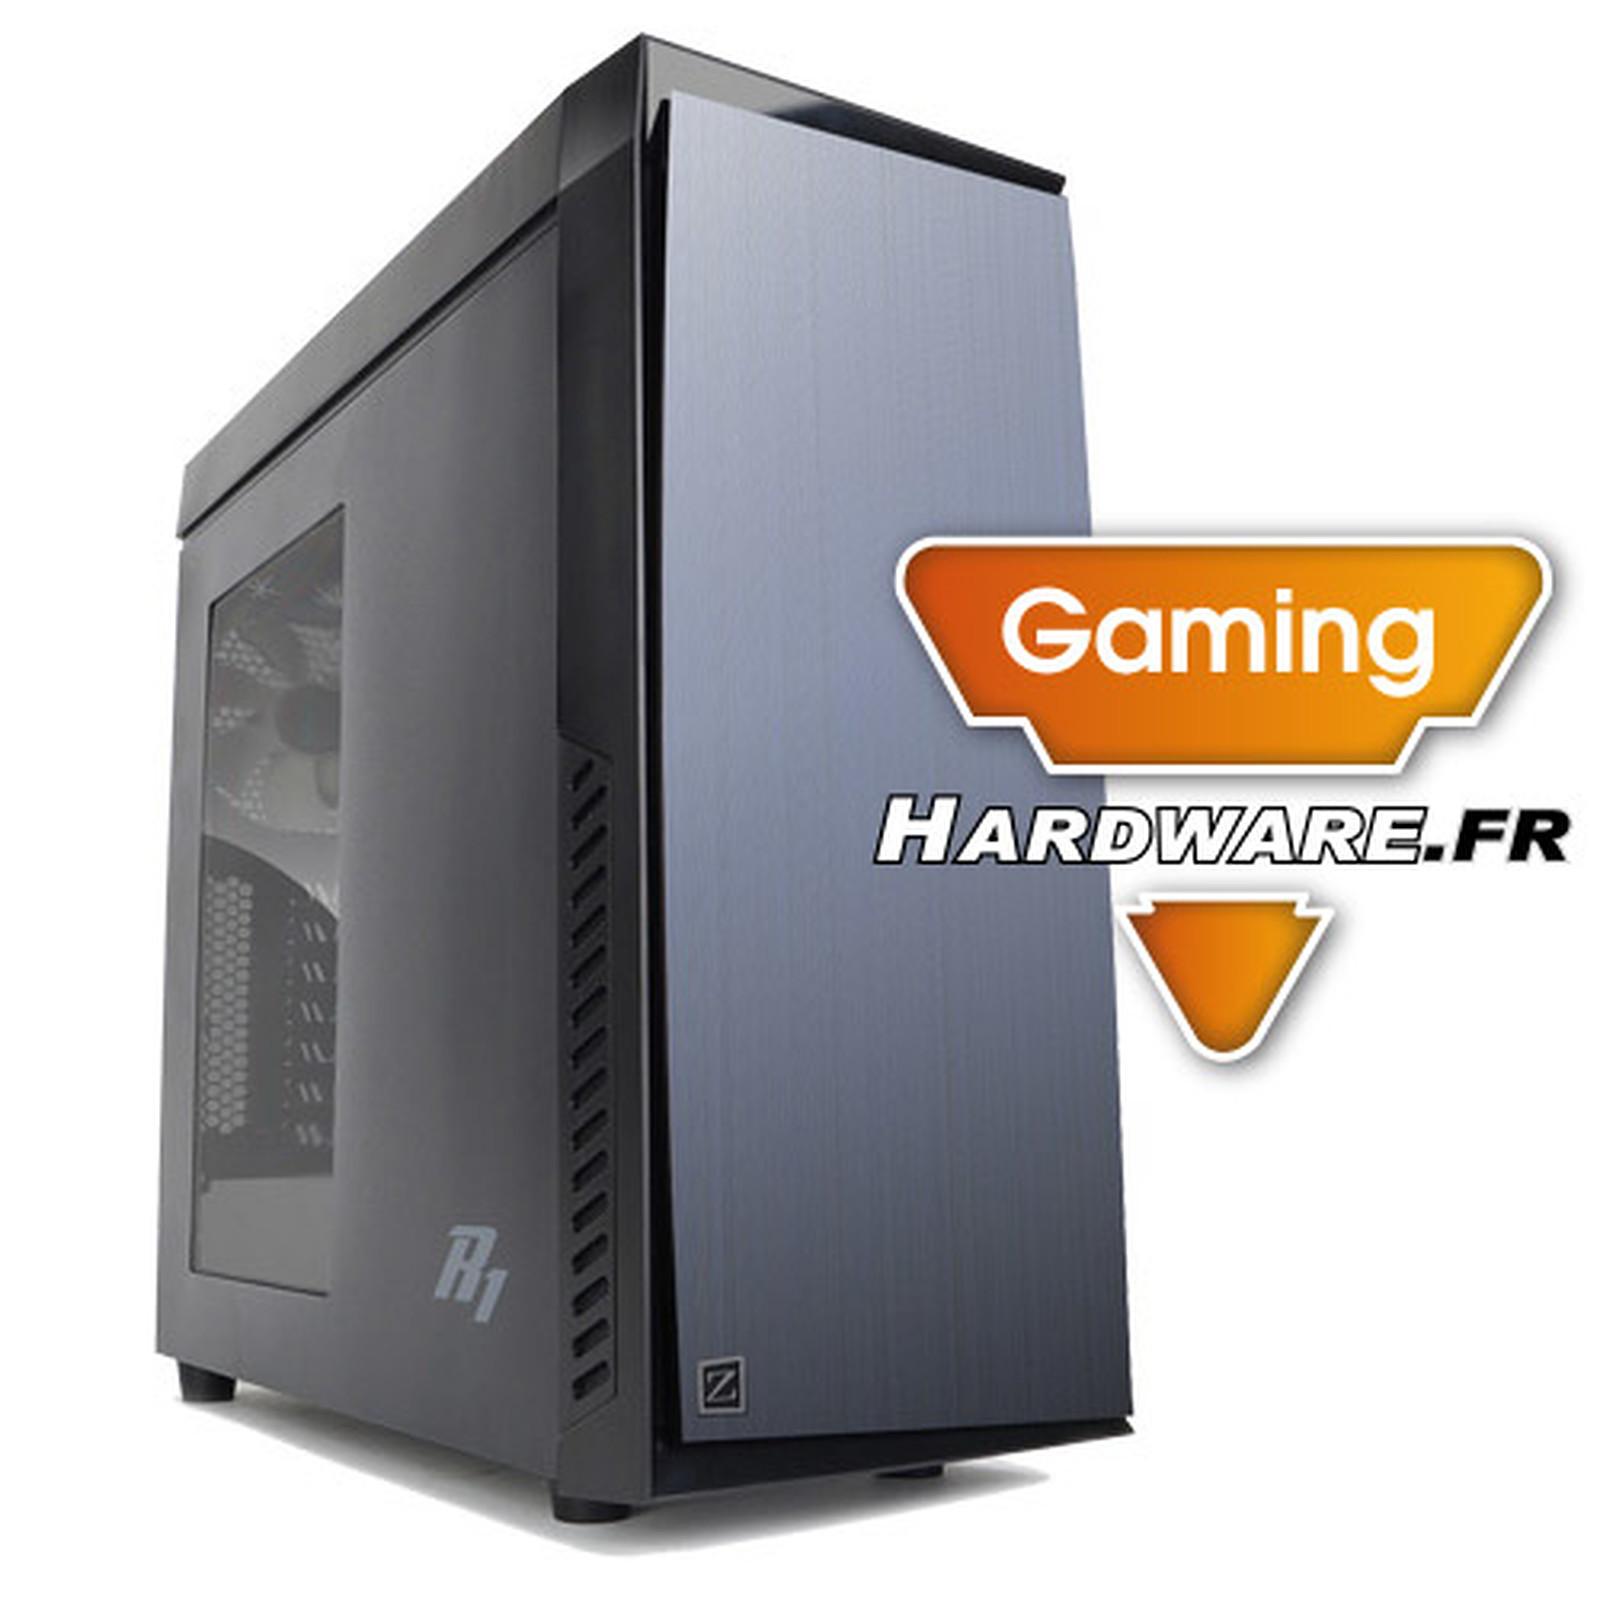 PC HardWare.fr Gaming GPUFlex - Windows 7 Premium 64 bits (monté)